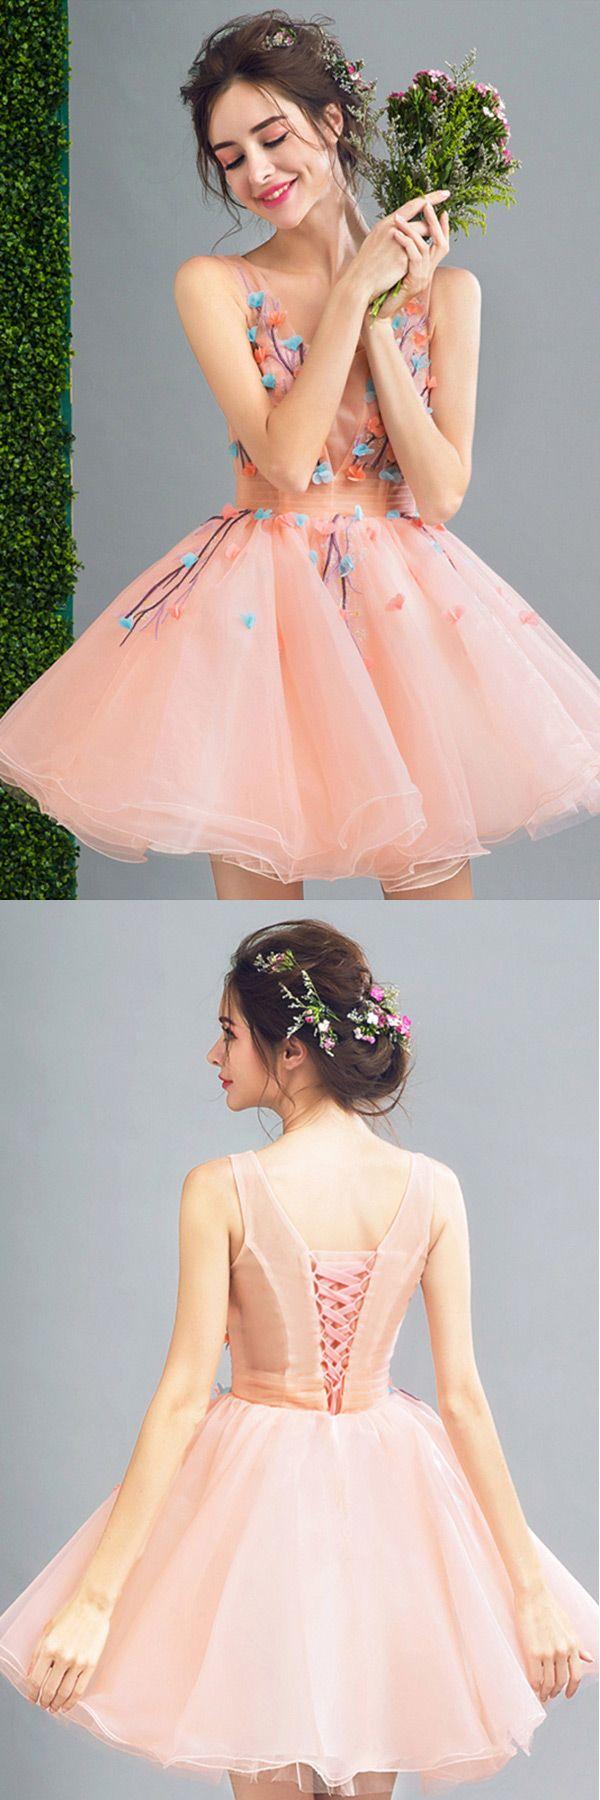 Peach ballgown scoop neck short organza formal dress with flowers